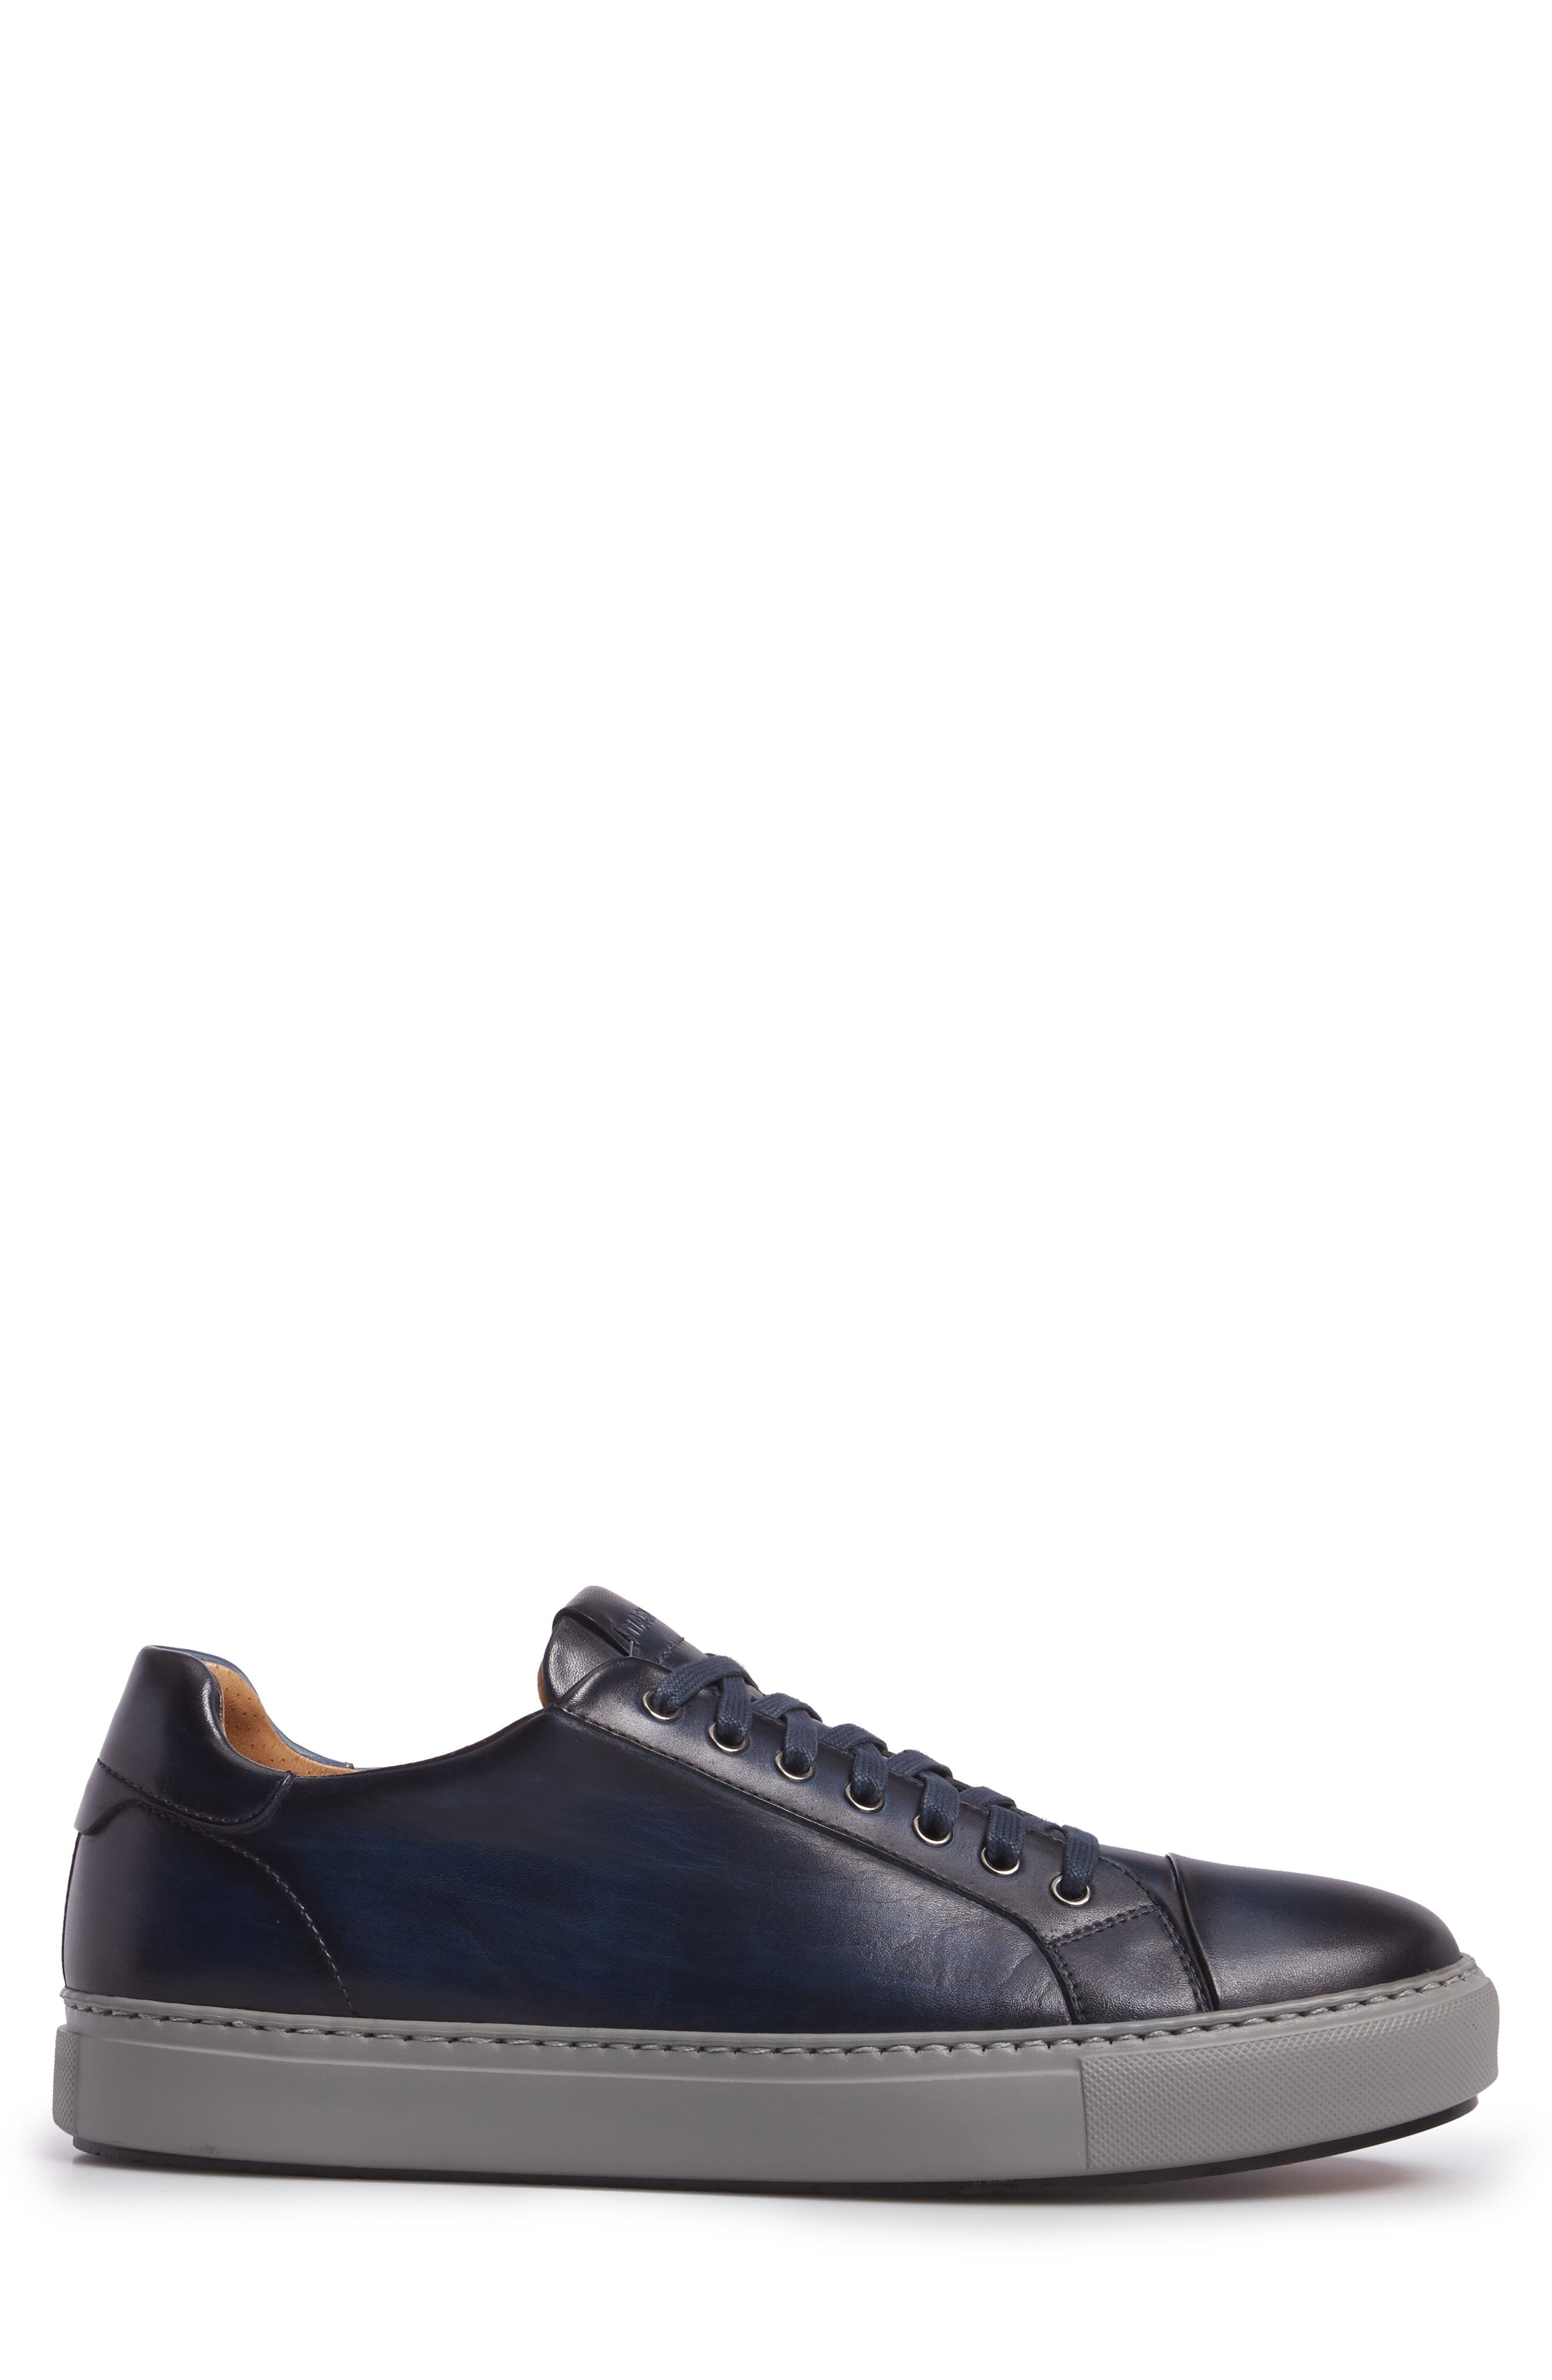 Kaden Lo Sneaker,                             Alternate thumbnail 3, color,                             Brushed Navy Leather